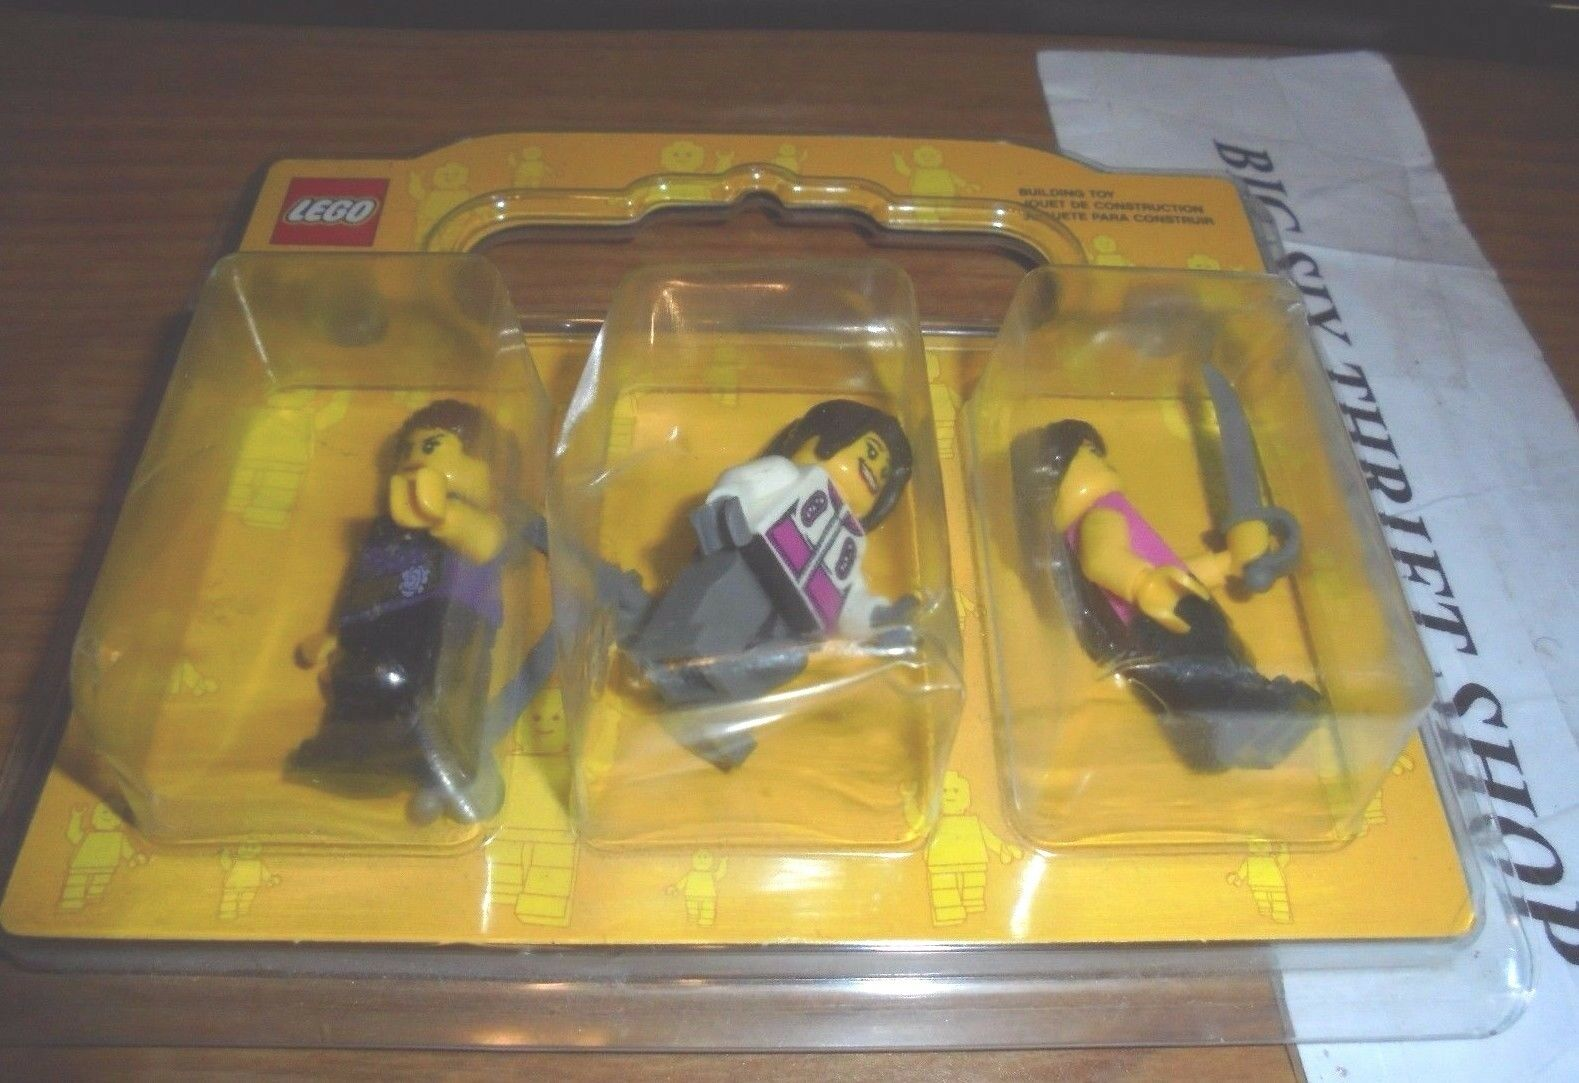 LEGO Exclusive Set Set Set Limited Edition Mini Figure 6a2314